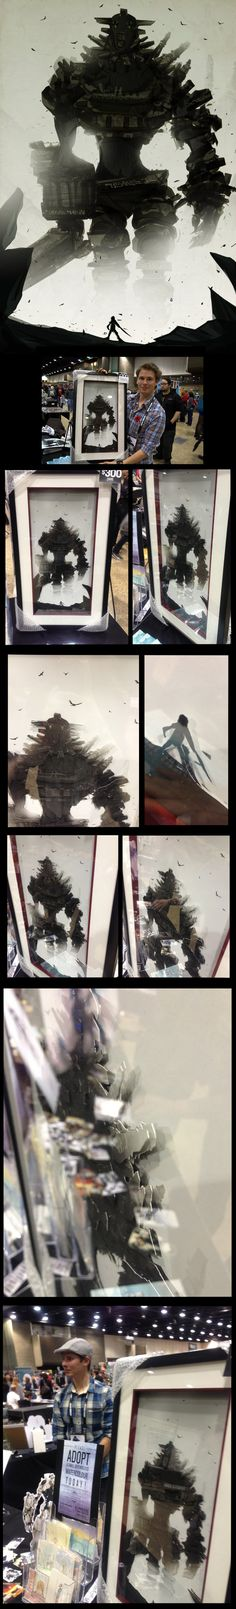 Colossus Paper Toll by ChasingArtwork.deviantart.com on @deviantART